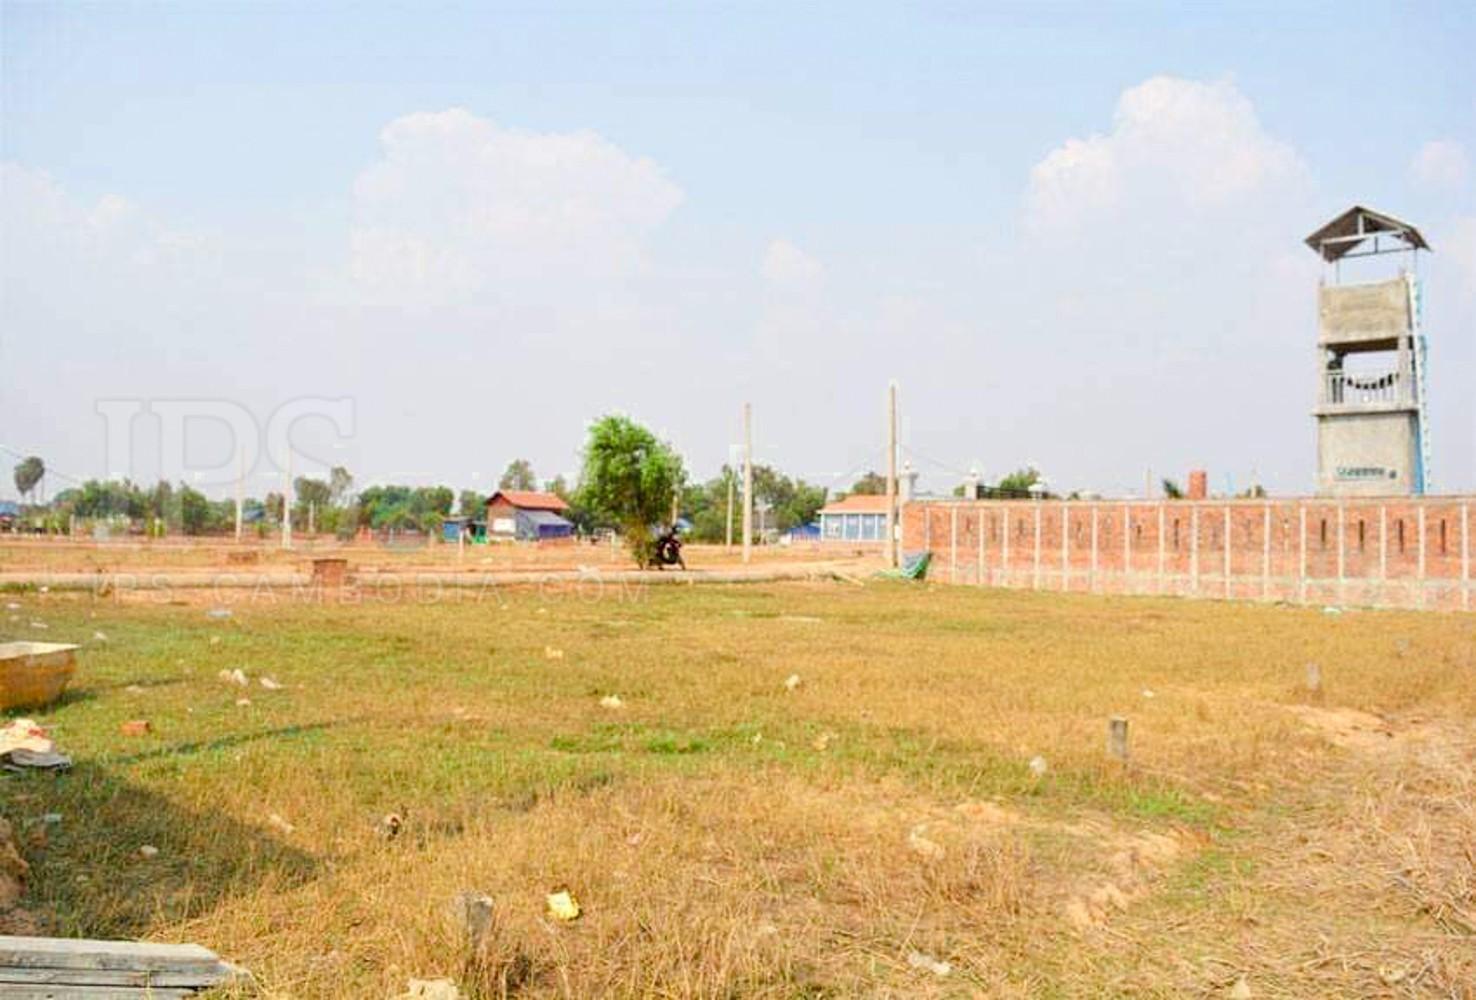 180 sq.m. Land For Sale - Bakong District, Siem Reap